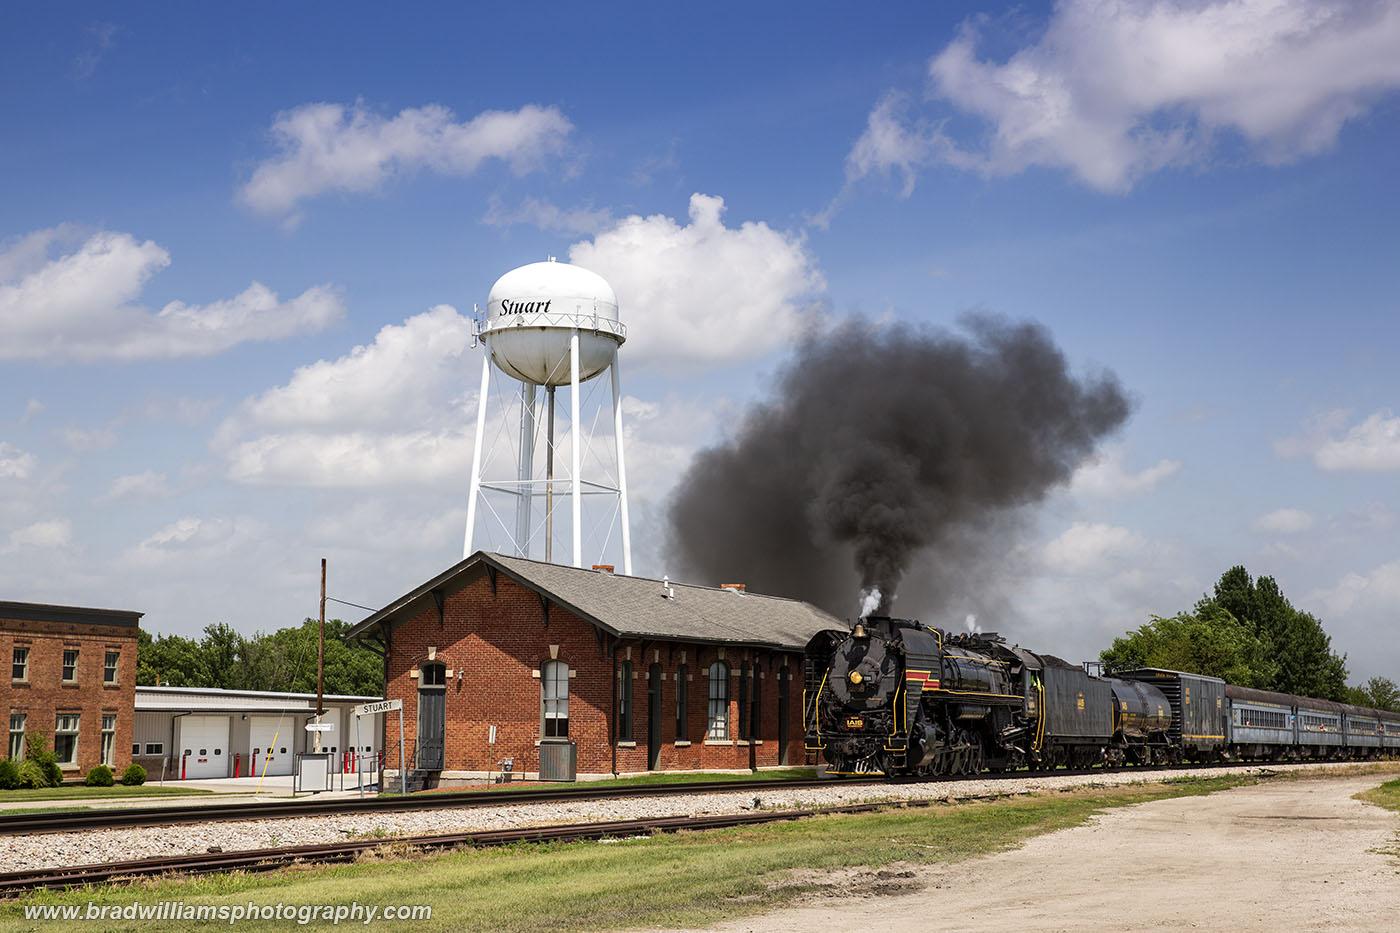 IAIS 6988 passing the Stuart, Iowa depot.